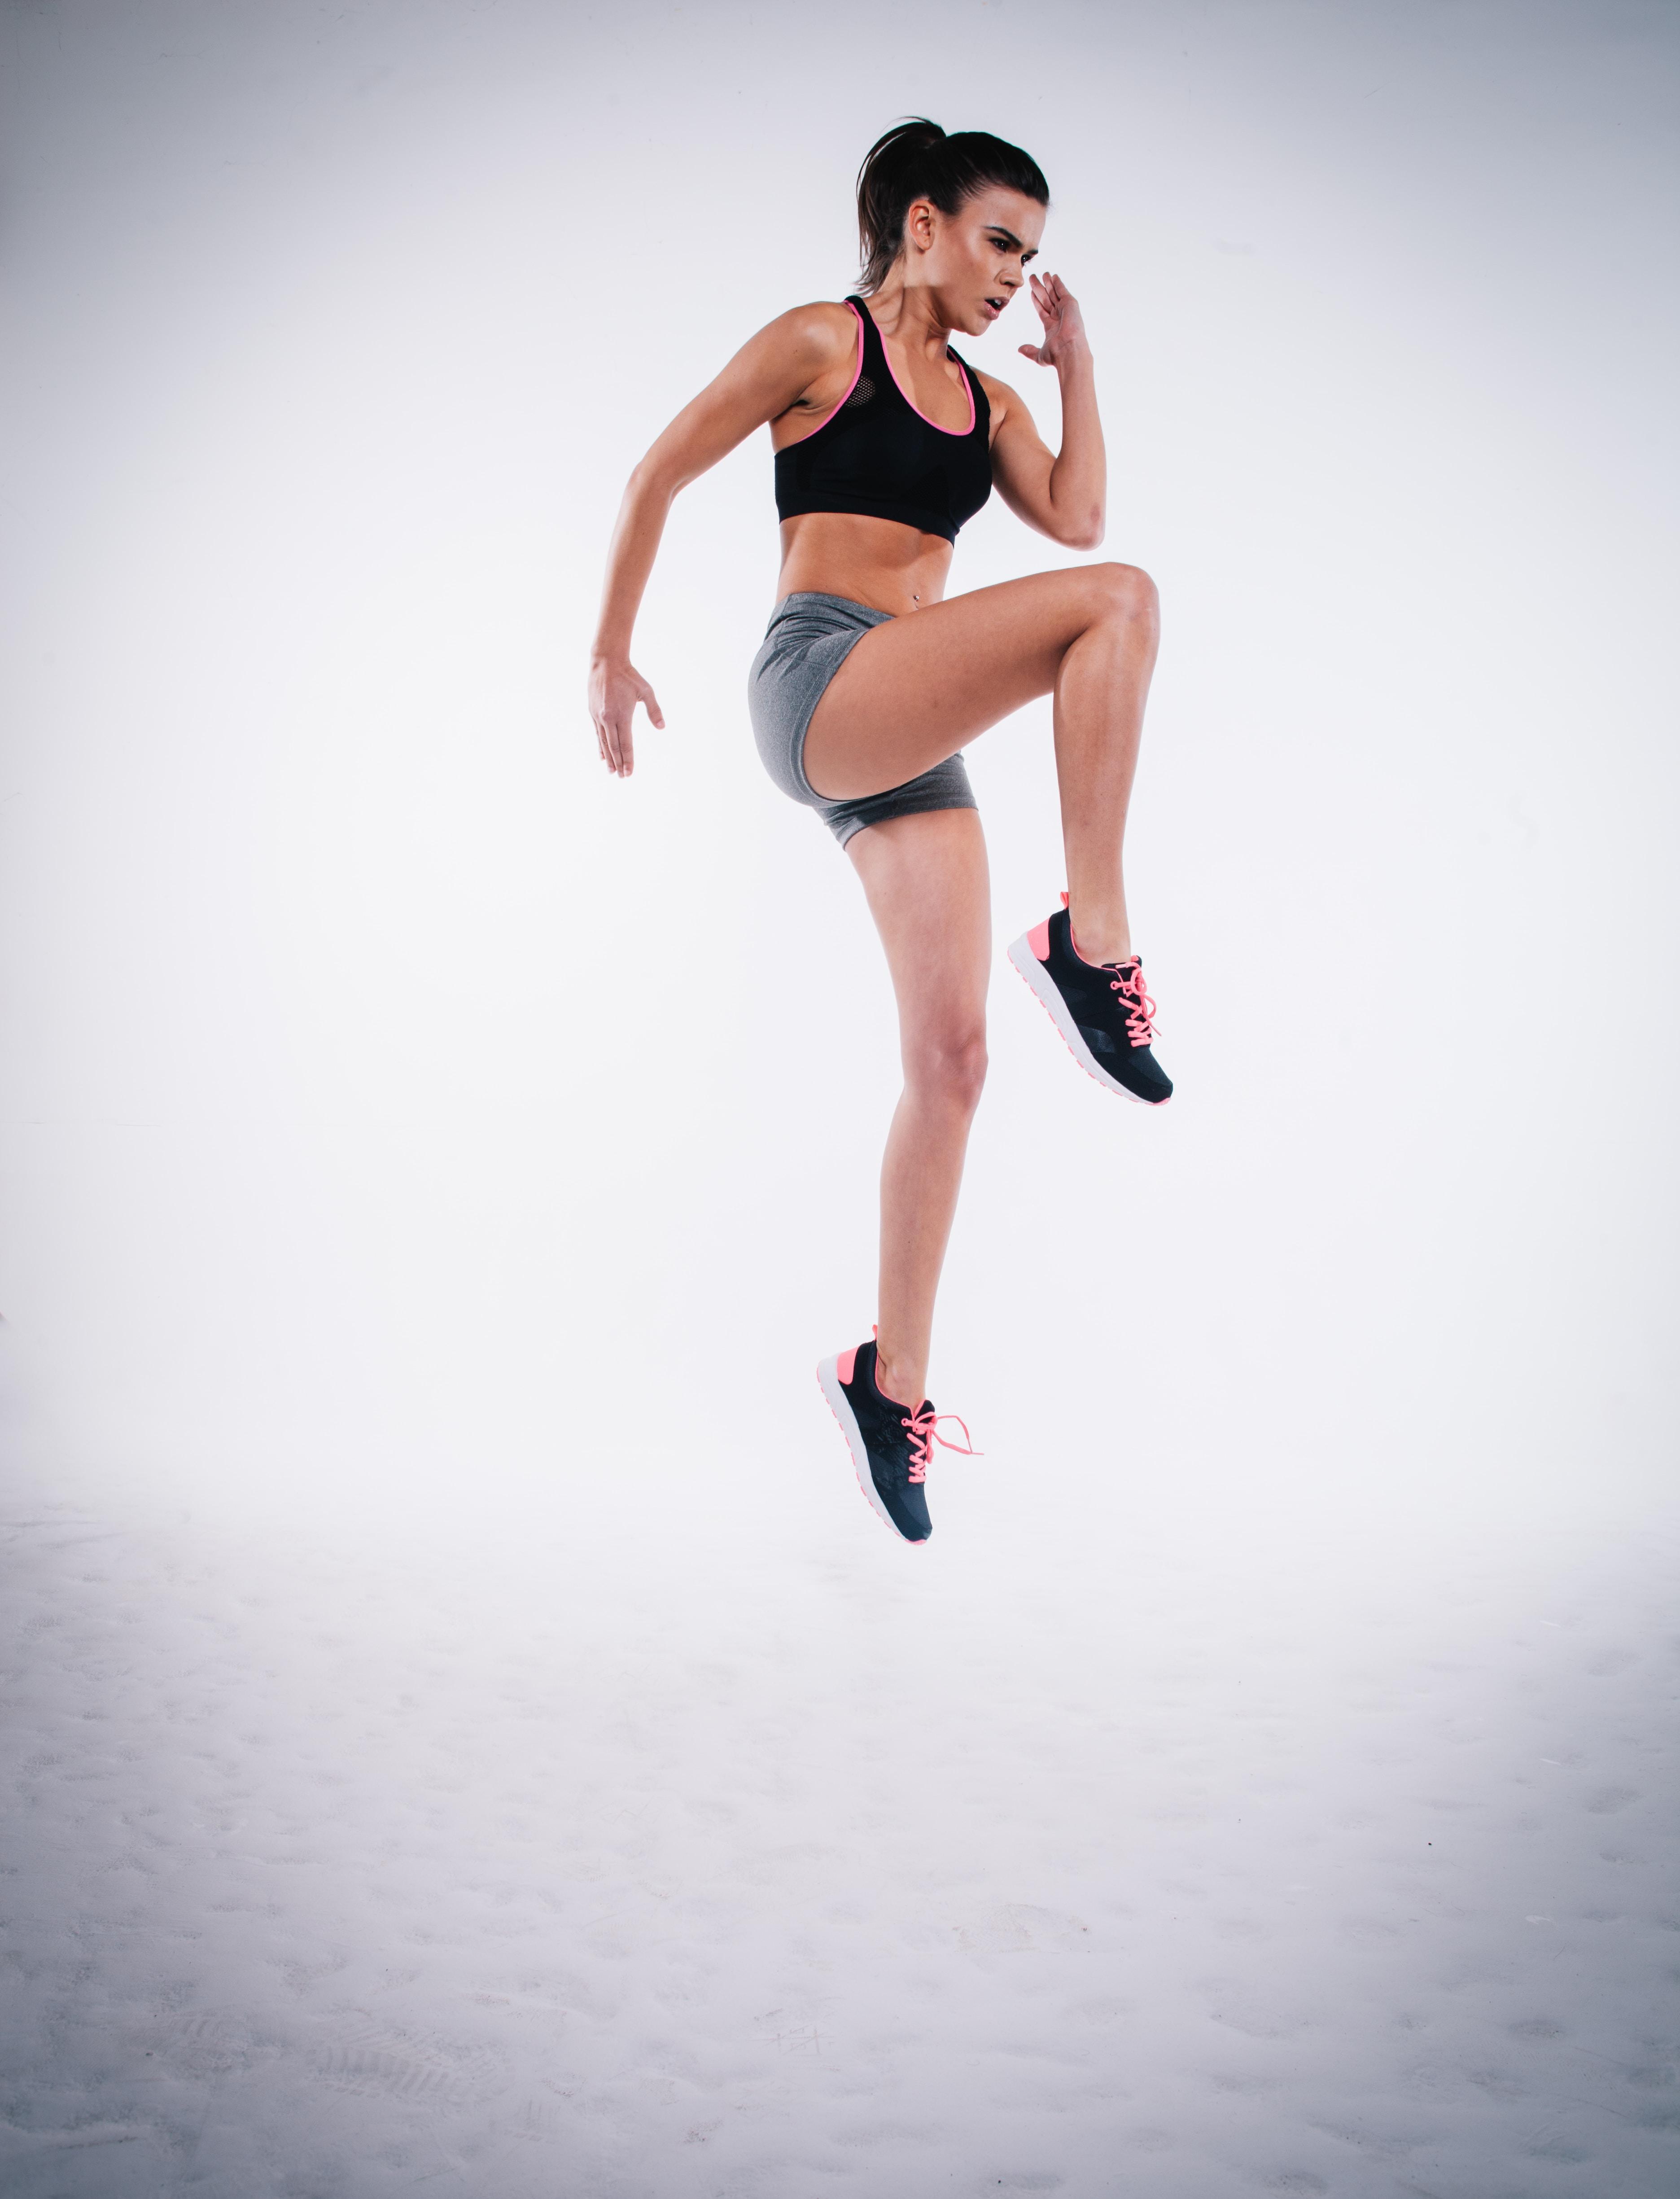 woman jumping near white wall paint